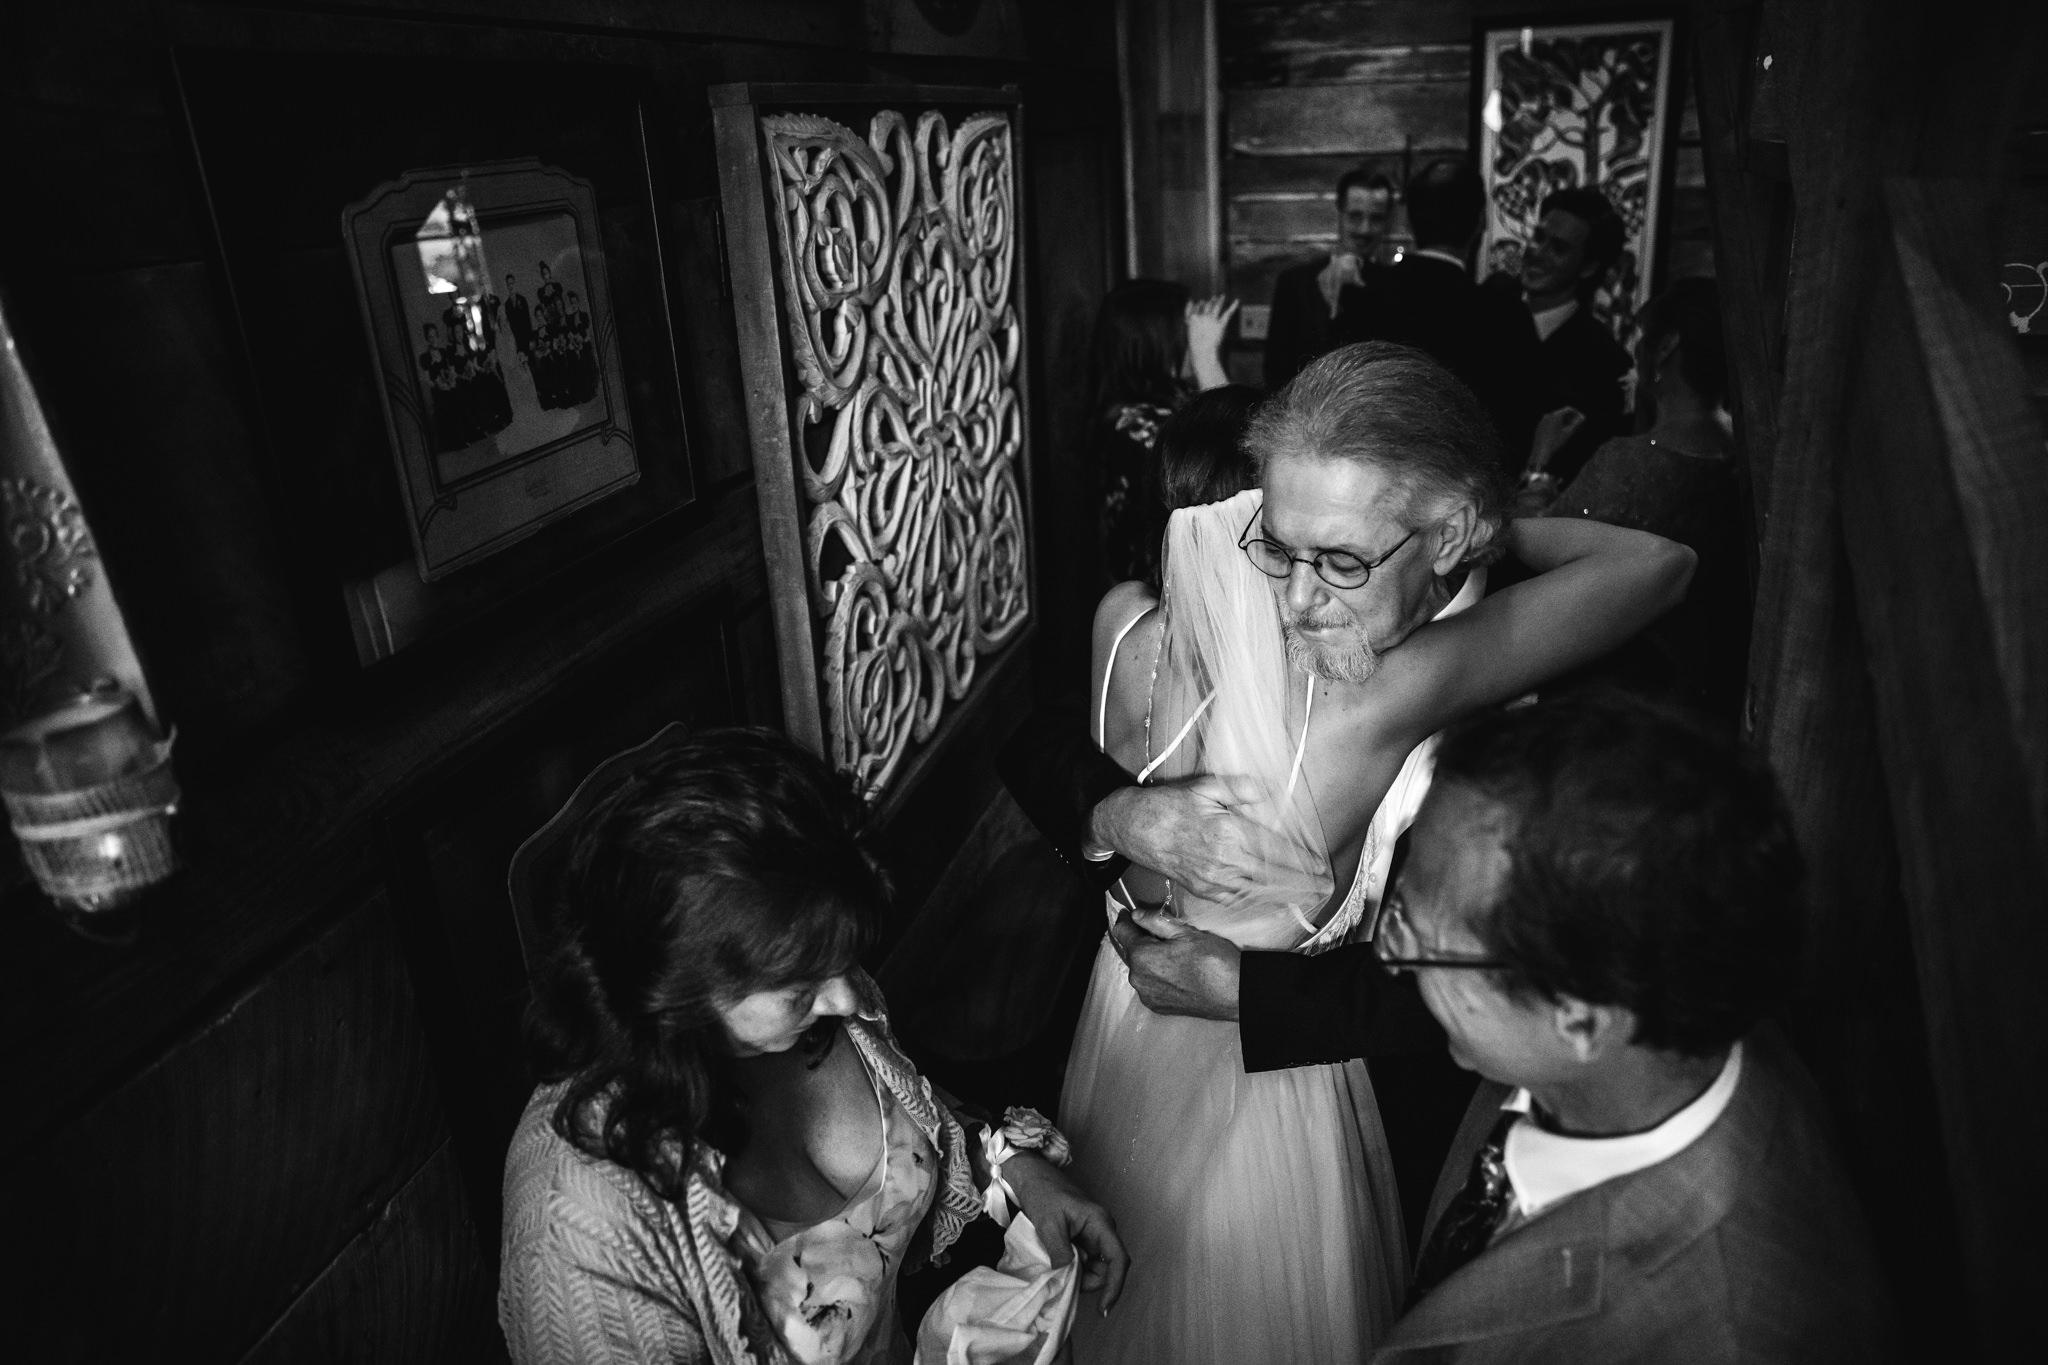 phantom-canyon-brewery-colorado-springs-wedding-photographer-414.jpg